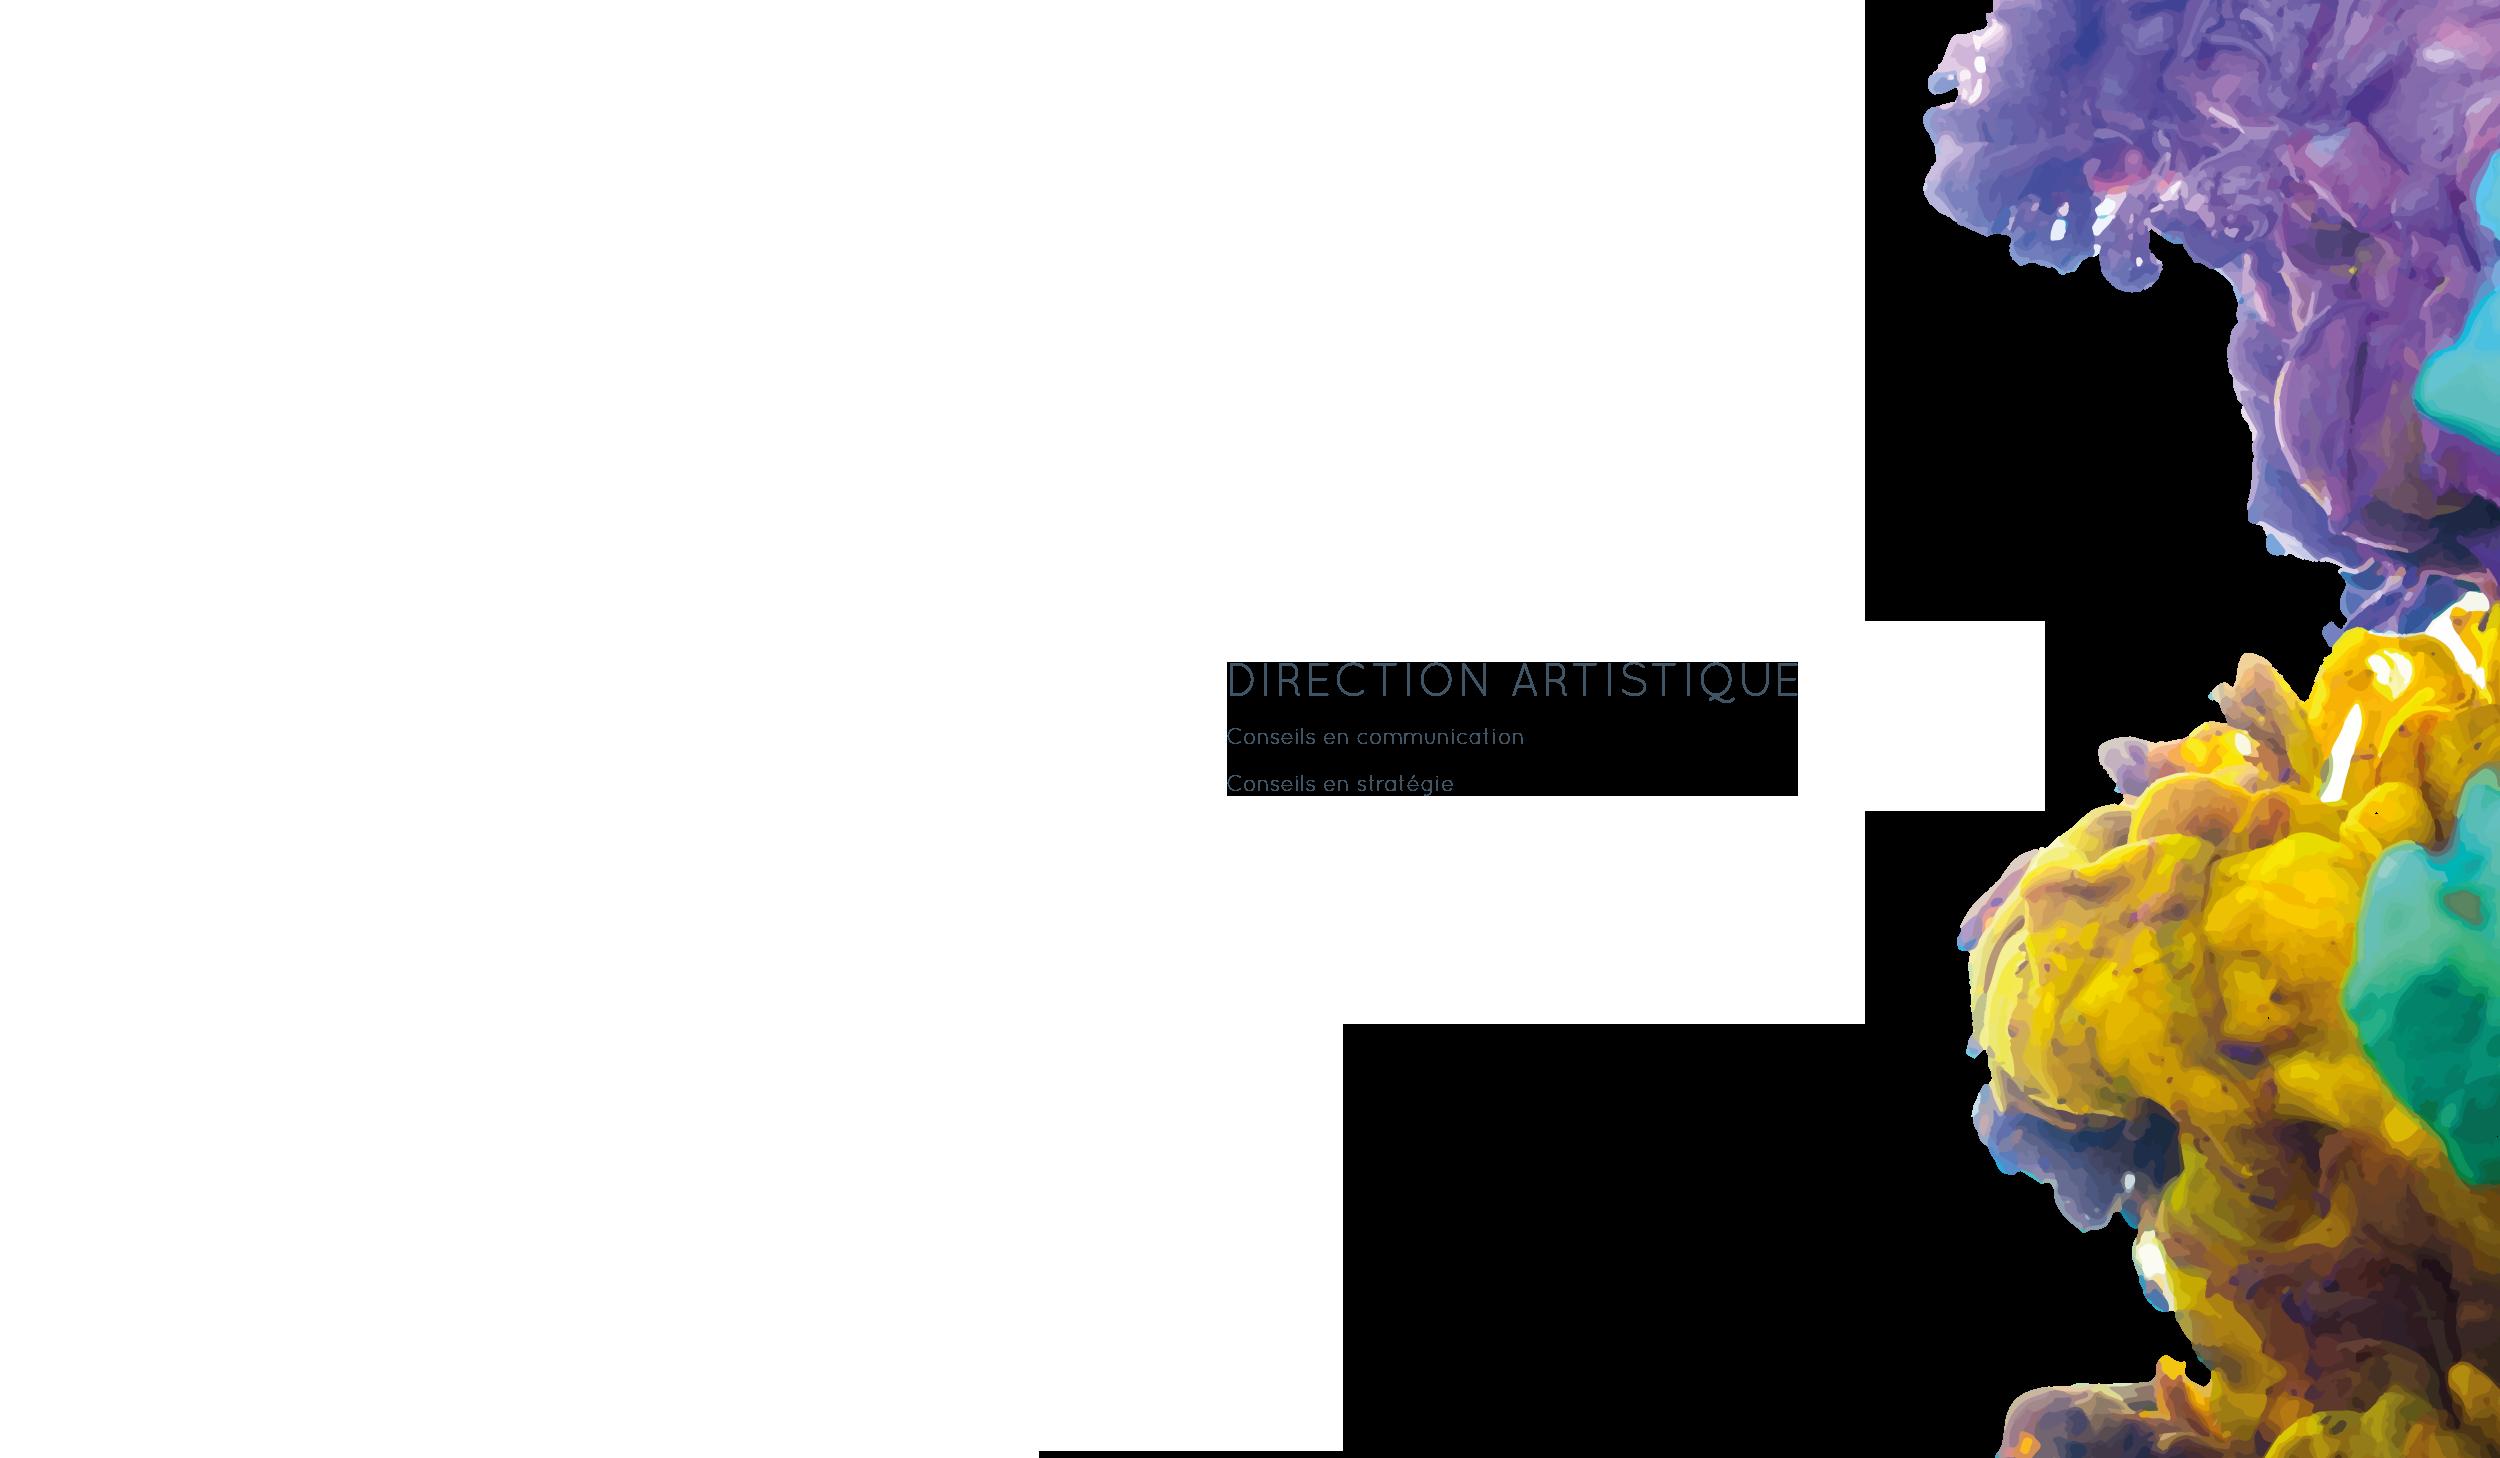 DIRECTRICE-21